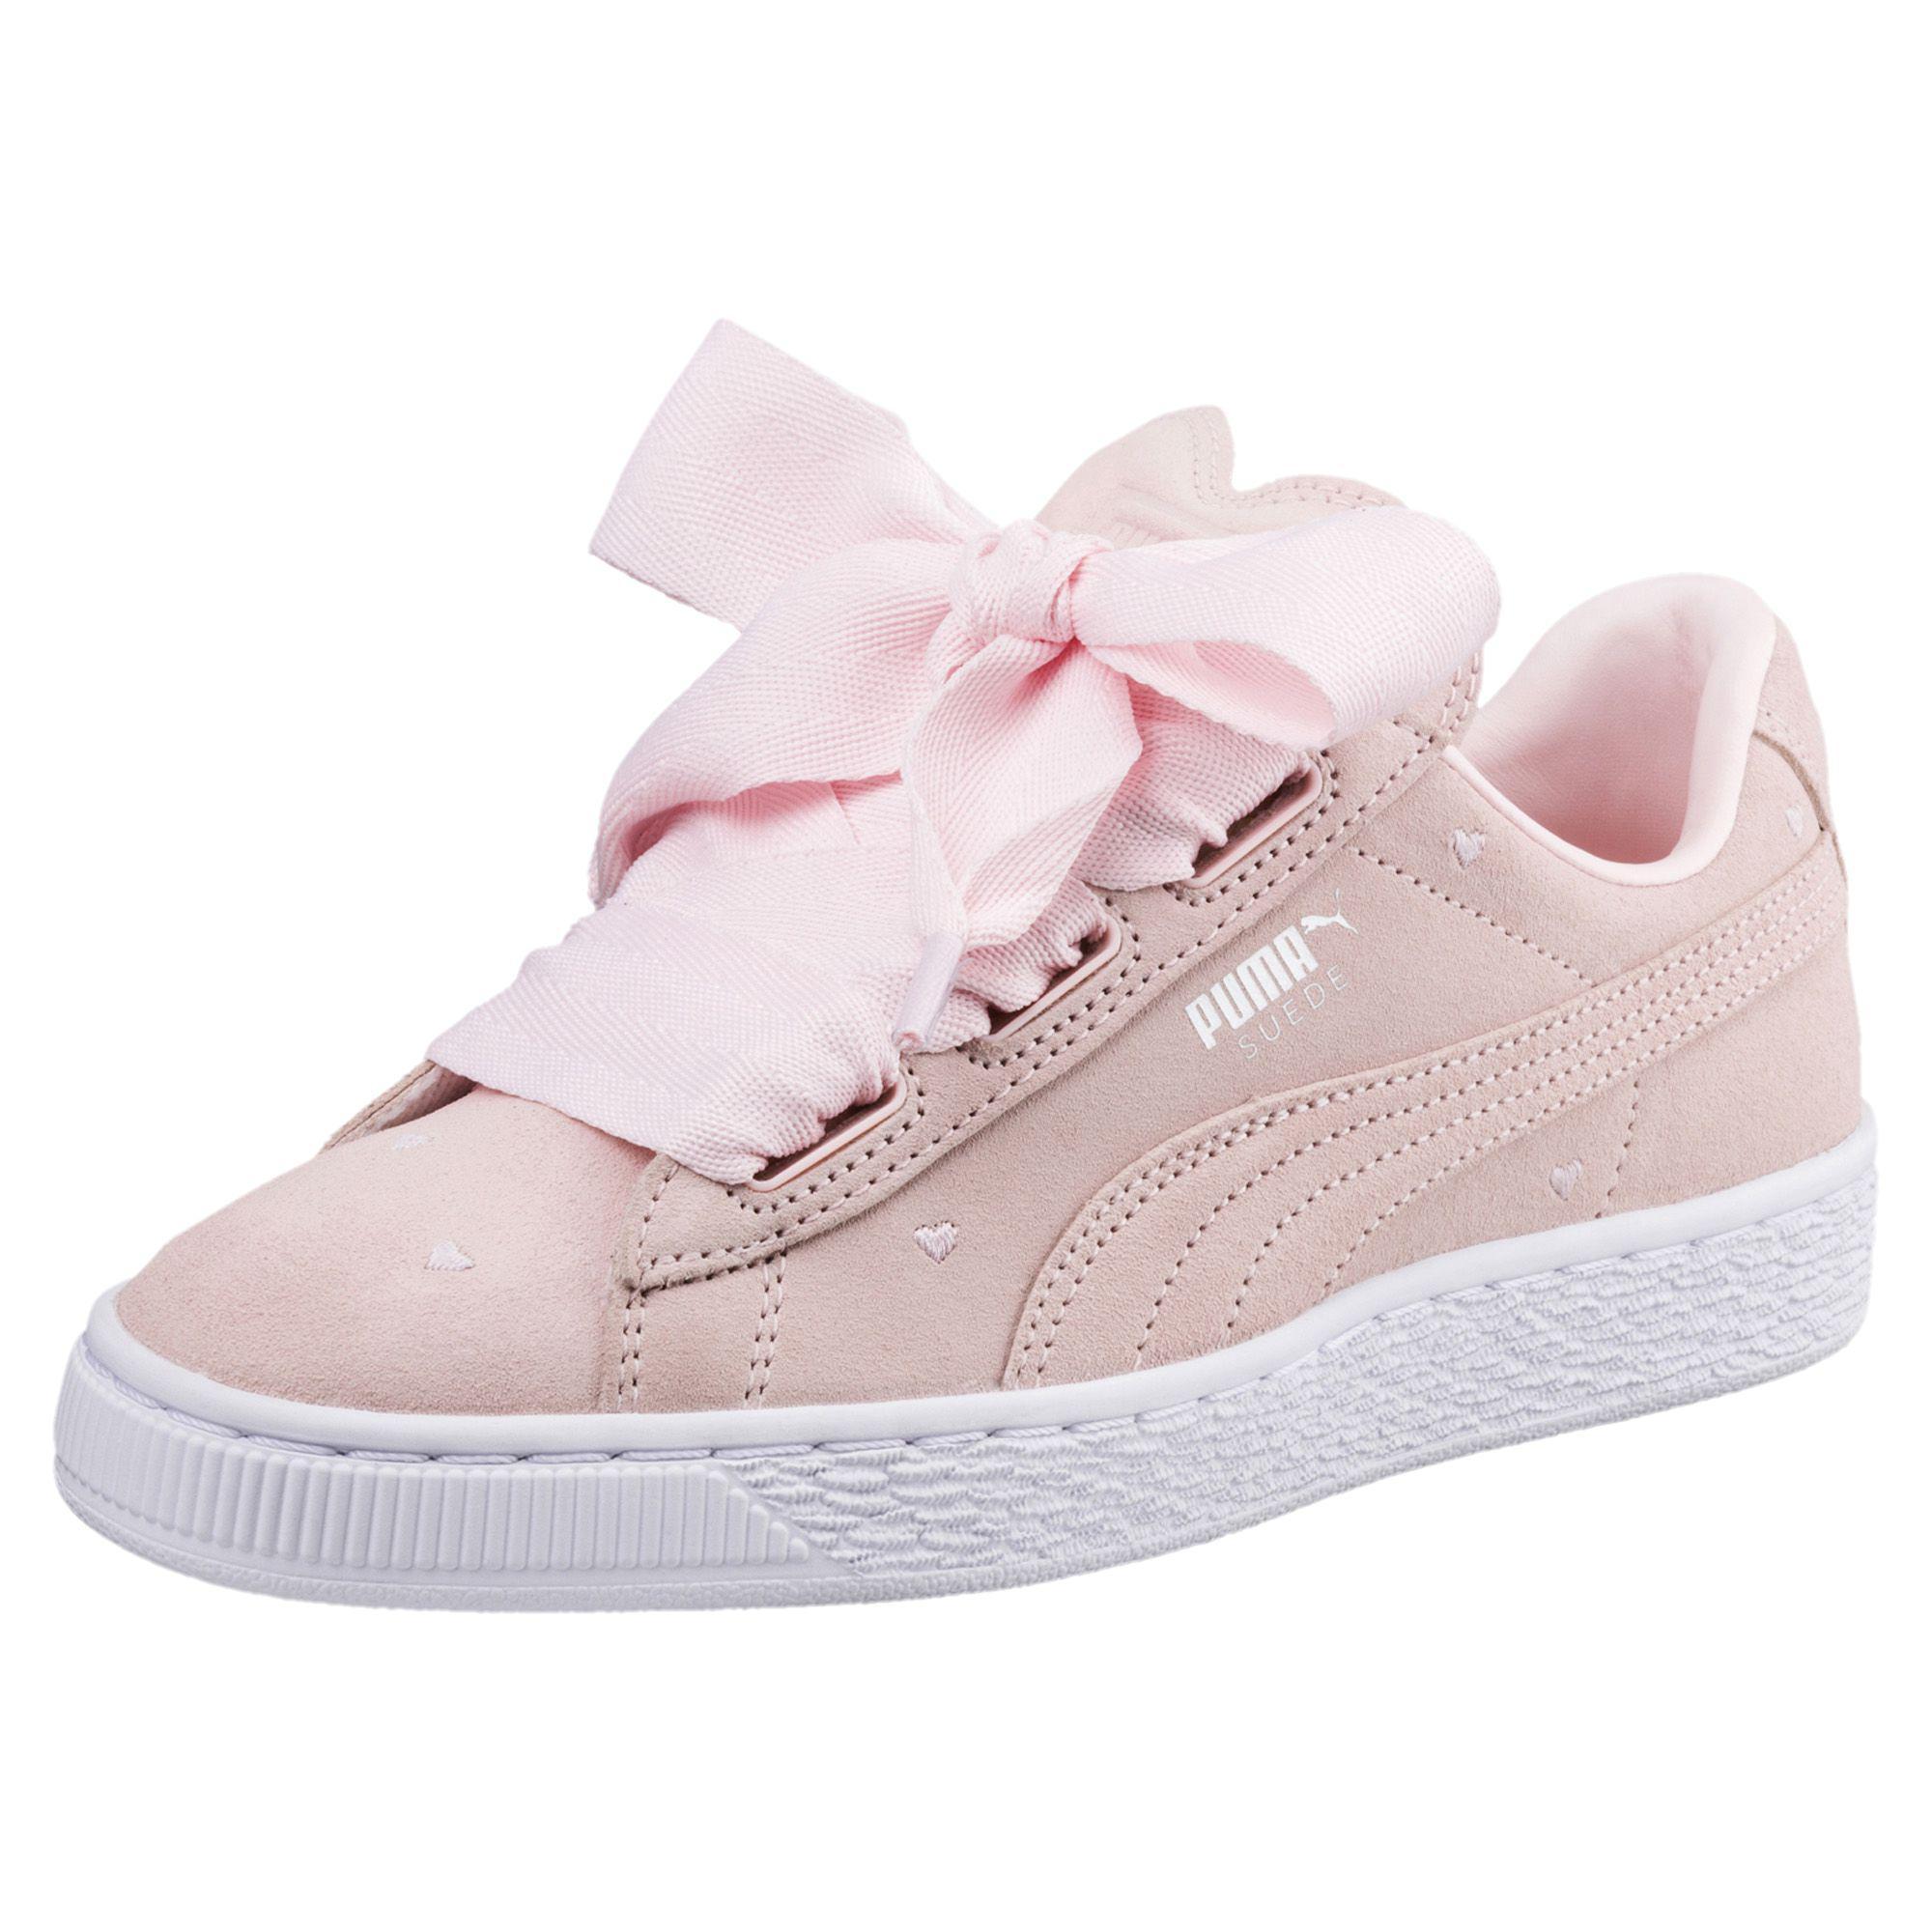 Lyst - PUMA Suede Heart Valentine Jr Sneakers in Pink 94533569d